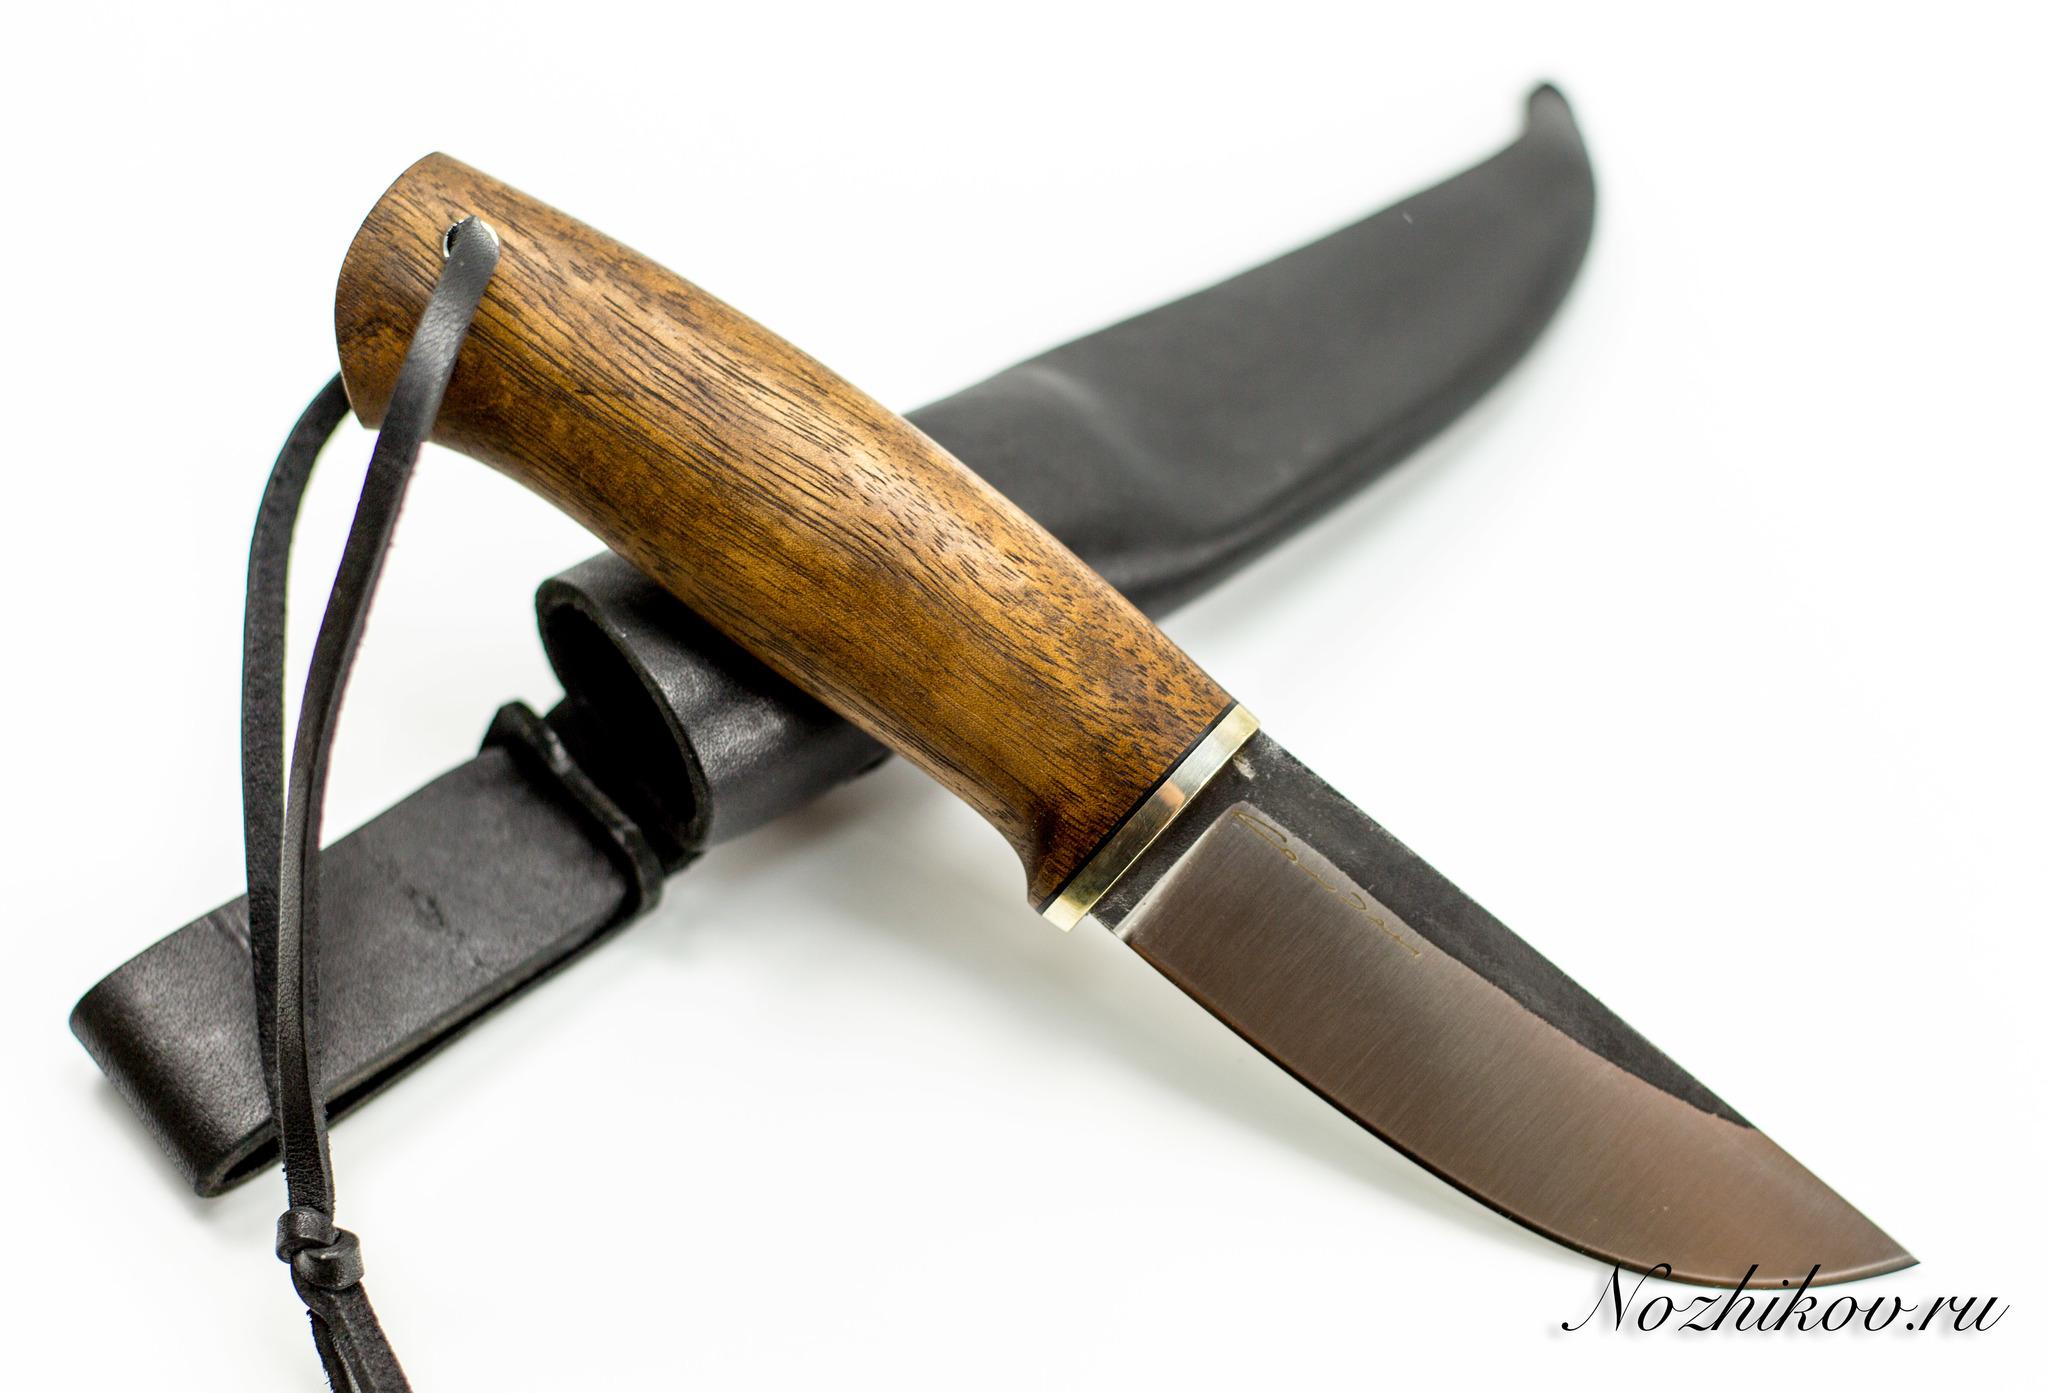 Нож Шмель, сталь N695, орех